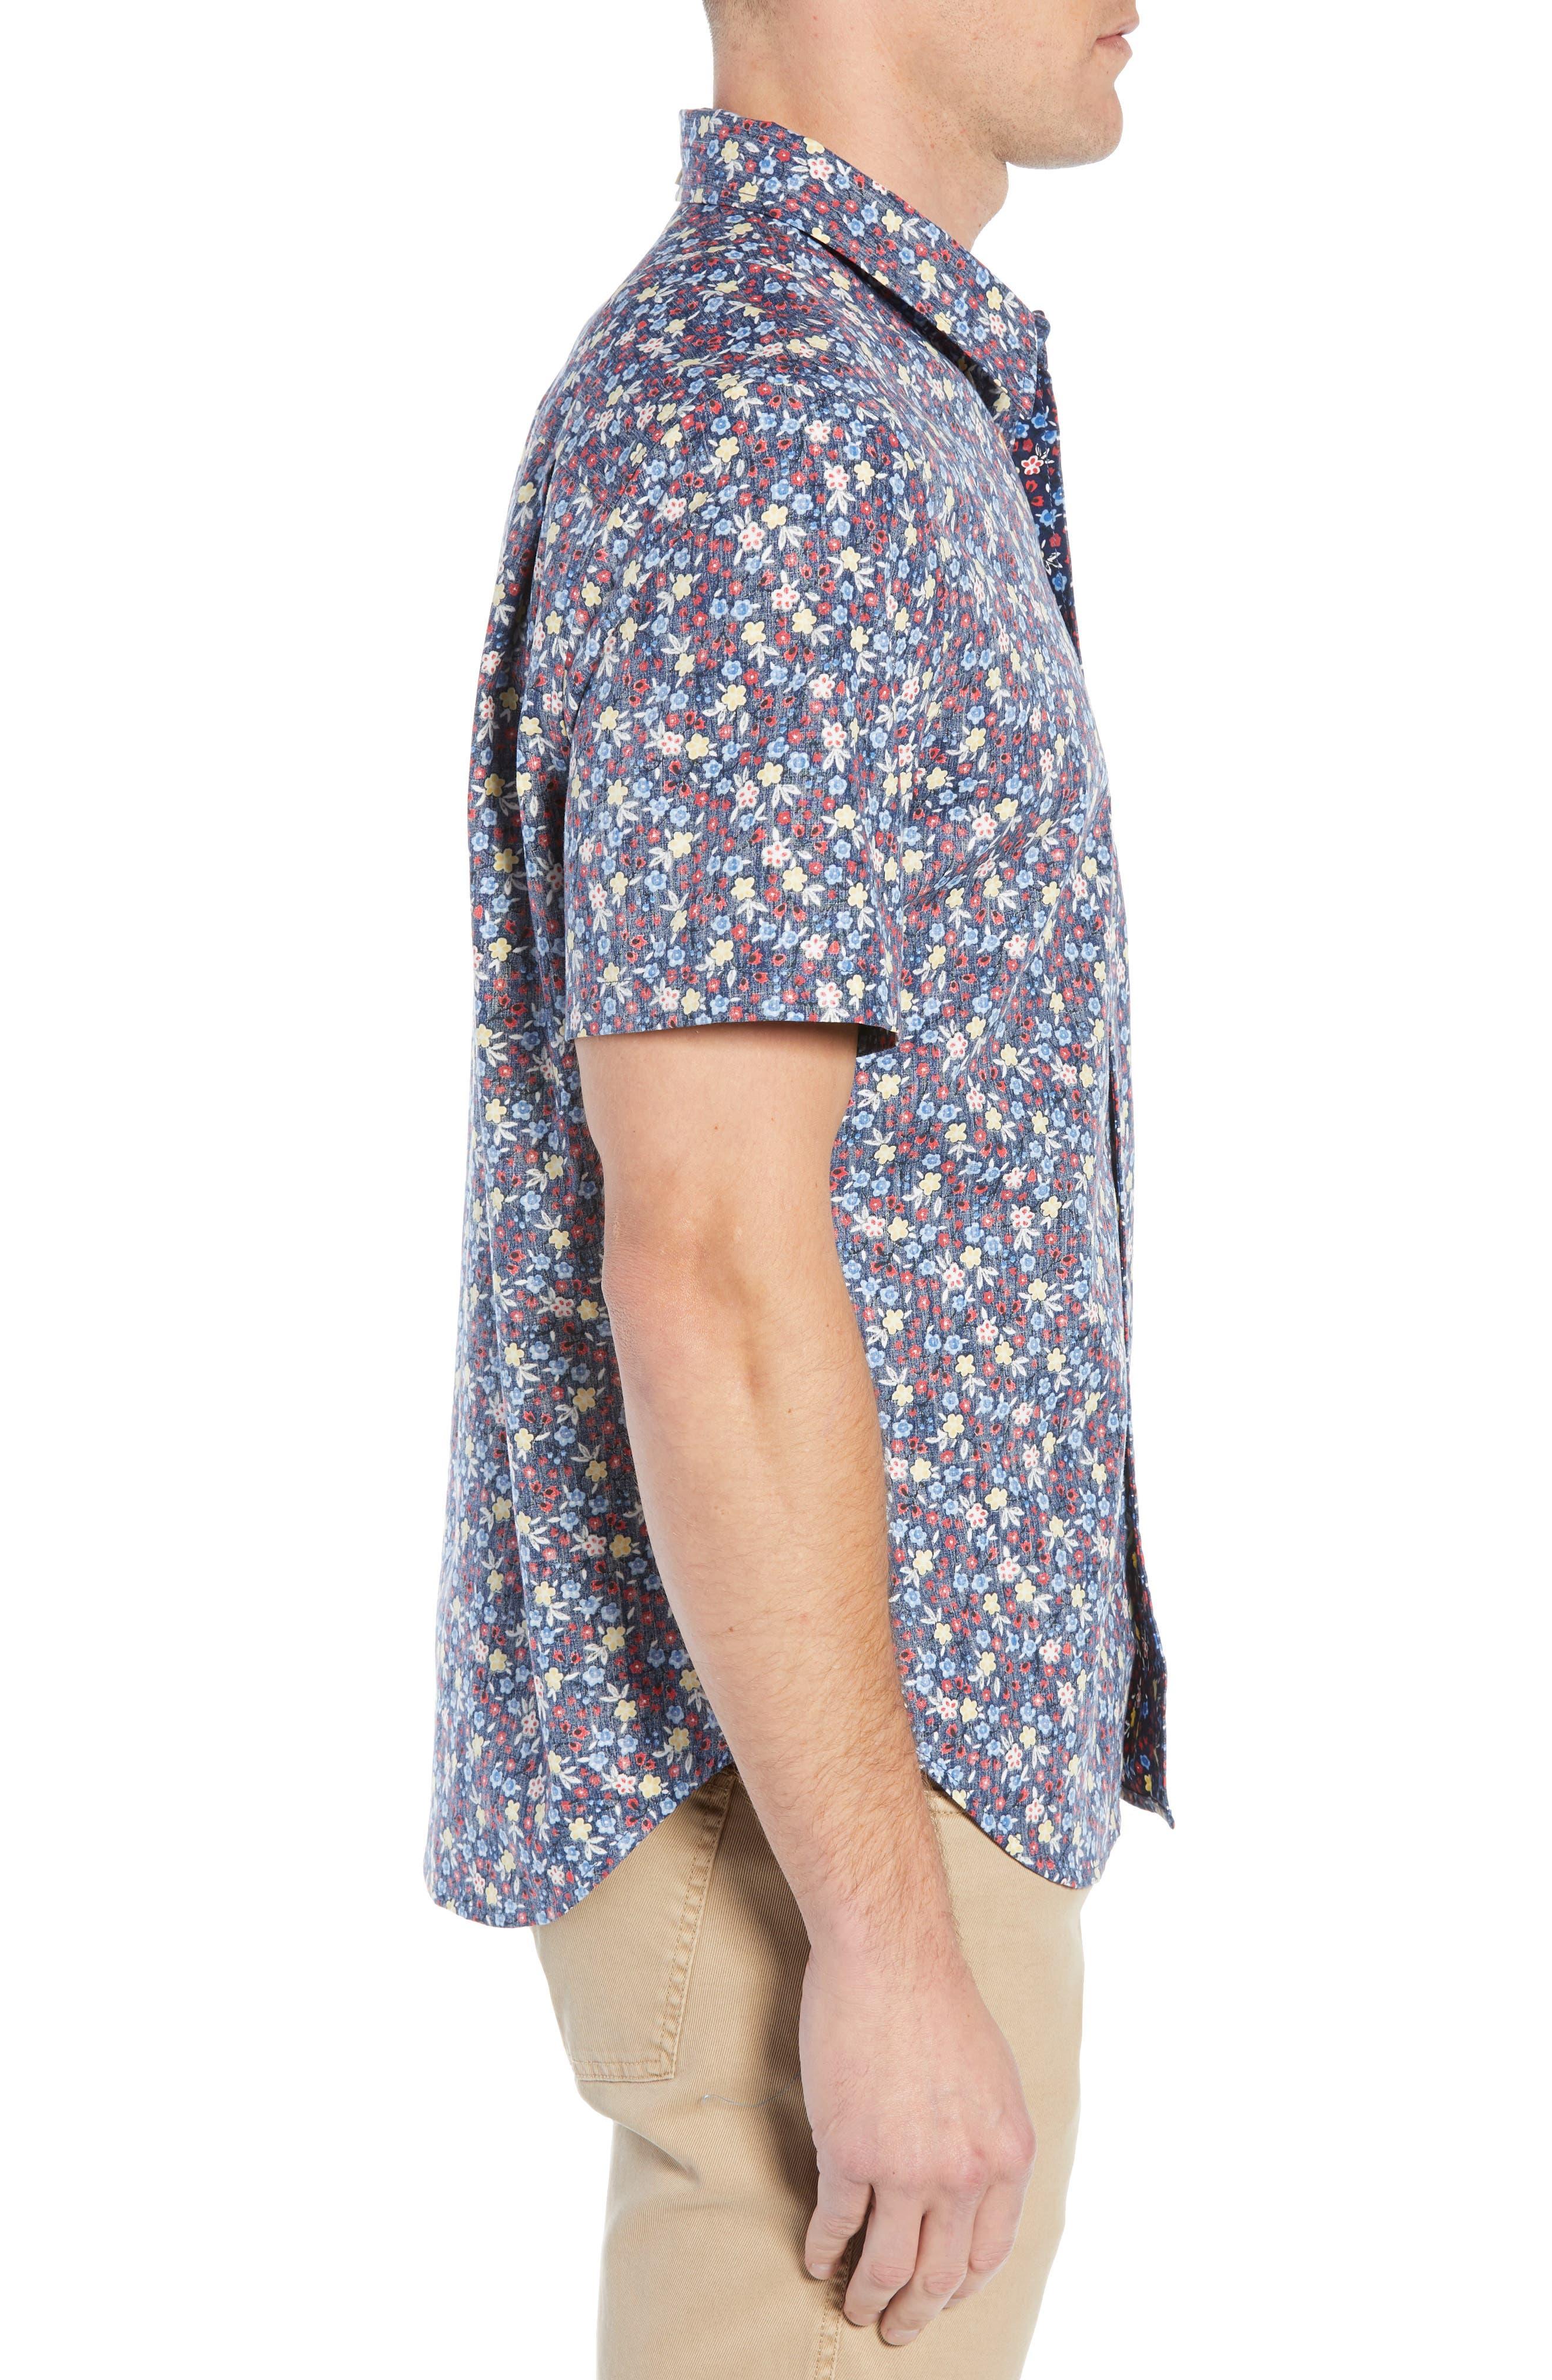 REYN SPOONER, Retro Tailored Fit Sport Shirt, Alternate thumbnail 4, color, MEDIEVAL BLUE